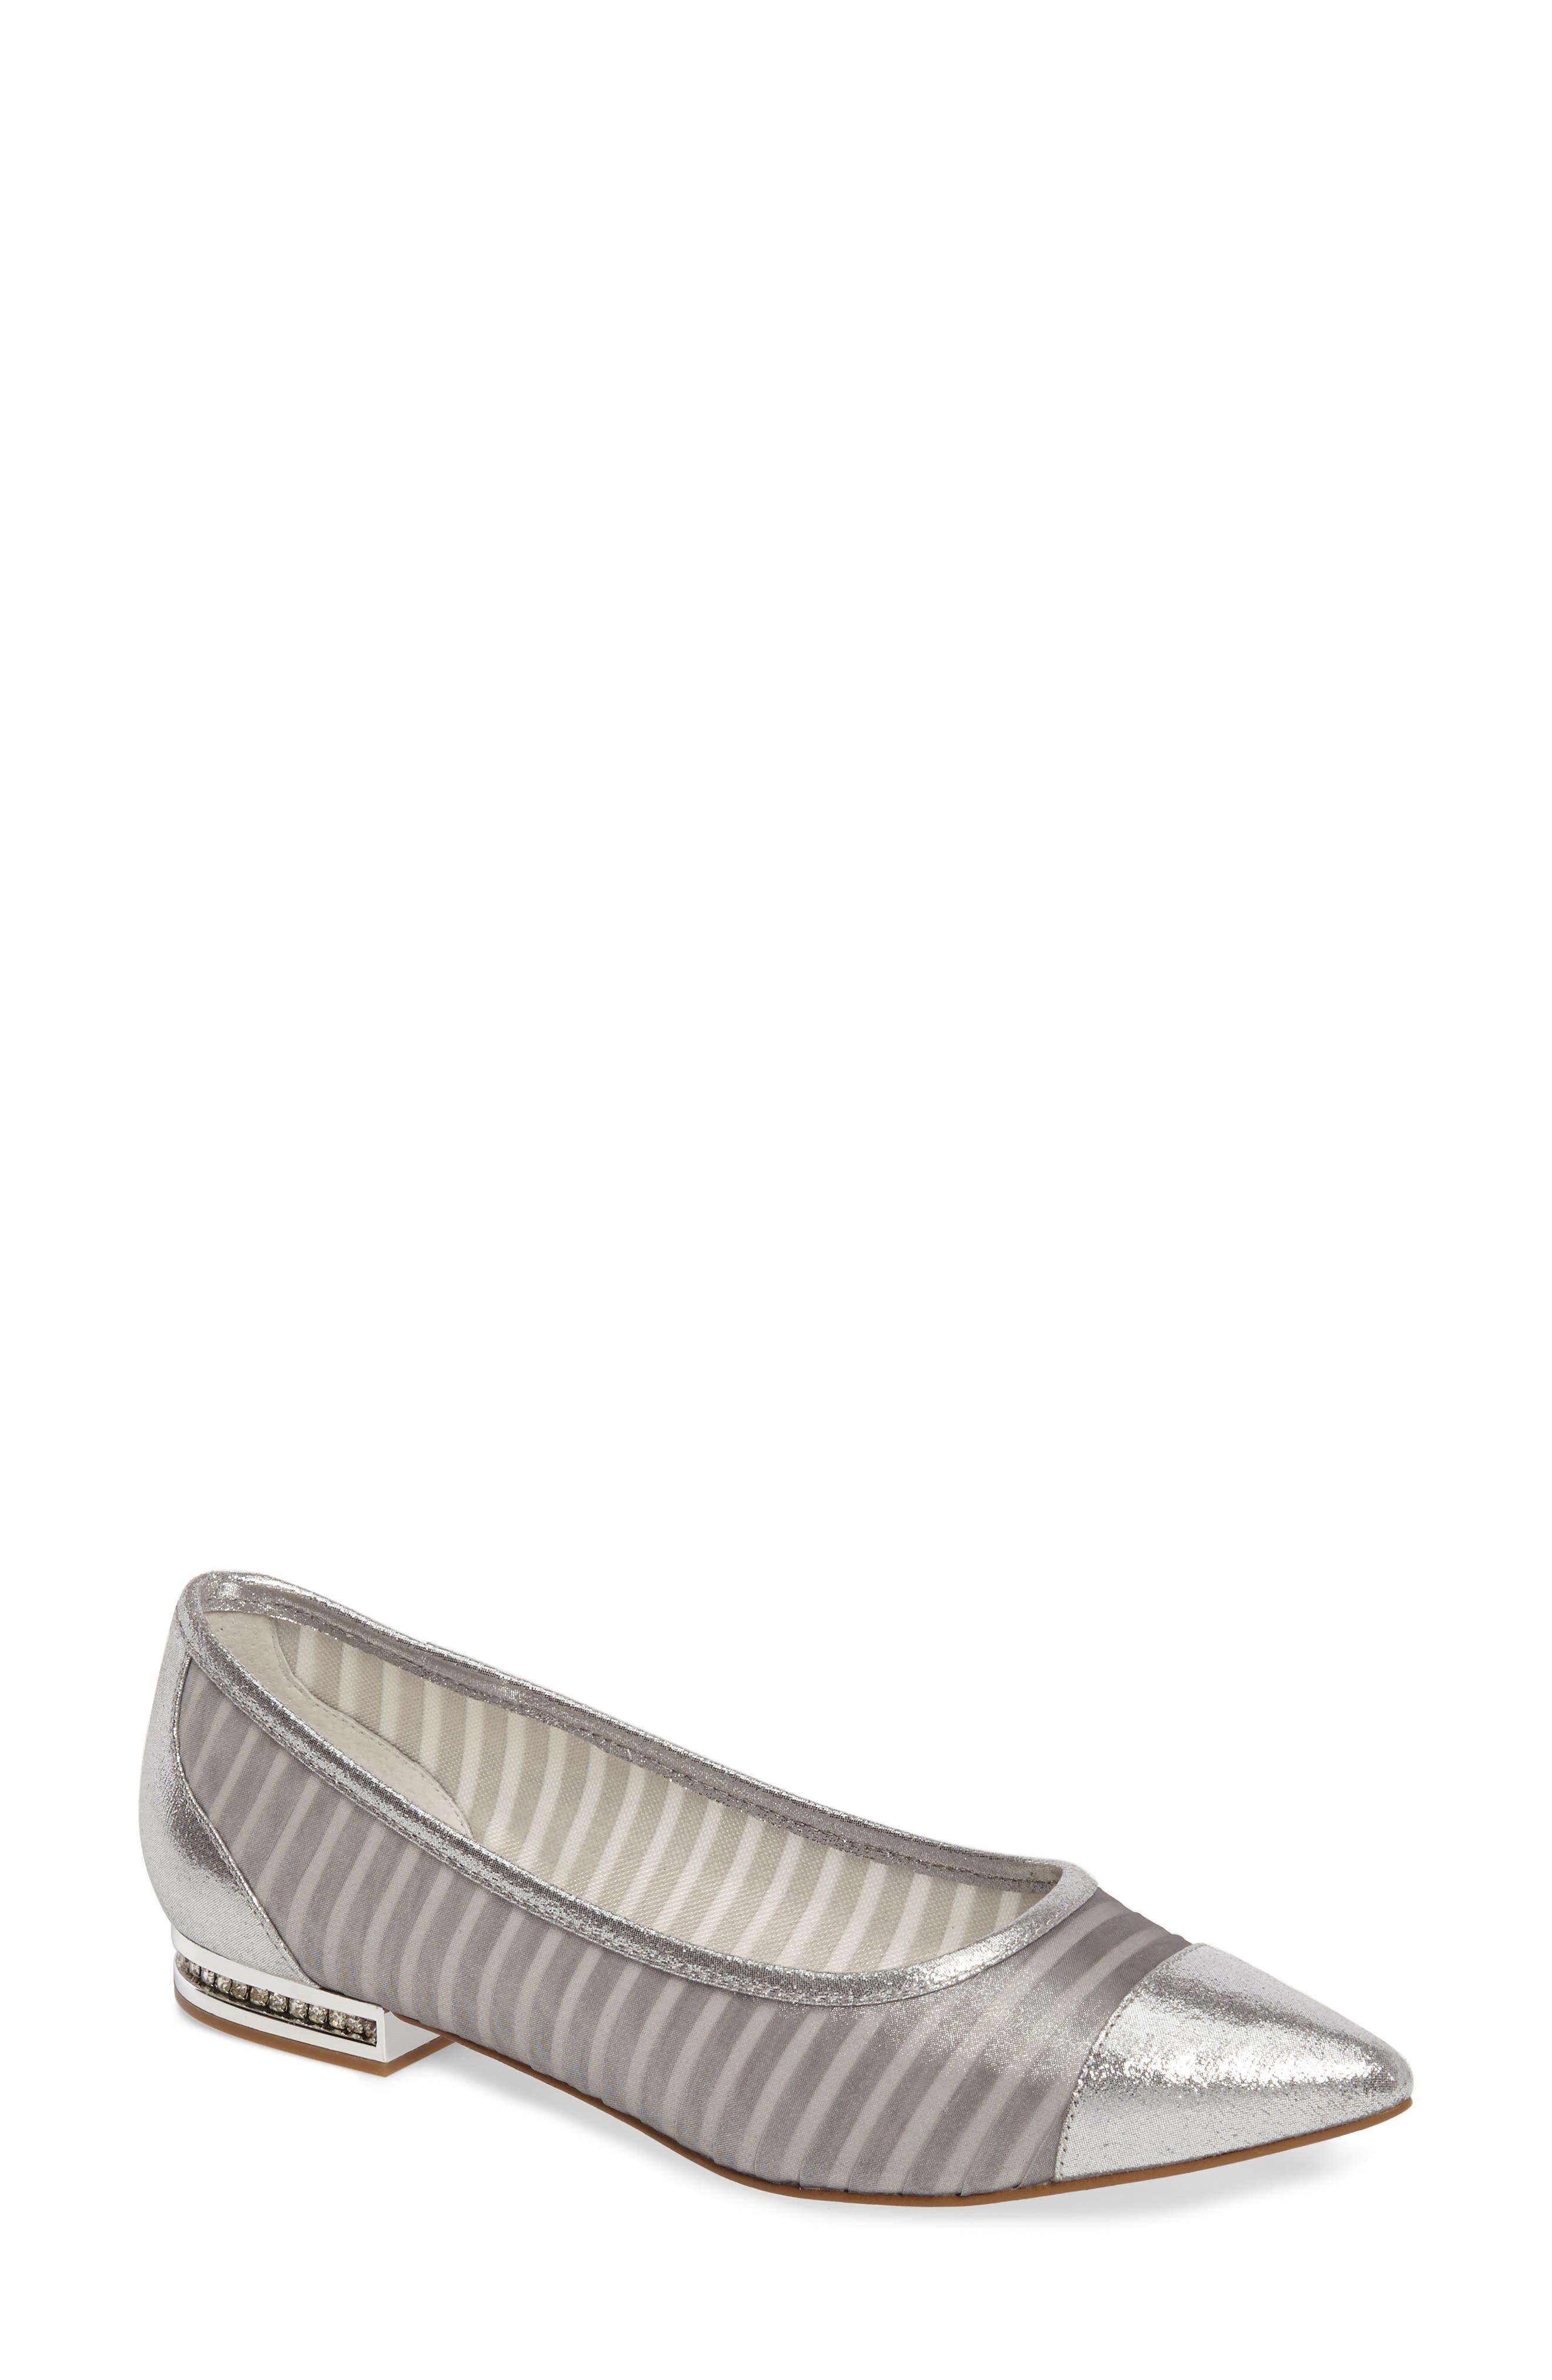 Tiffany Pointy Toe Flat,                         Main,                         color, Silver Fabric